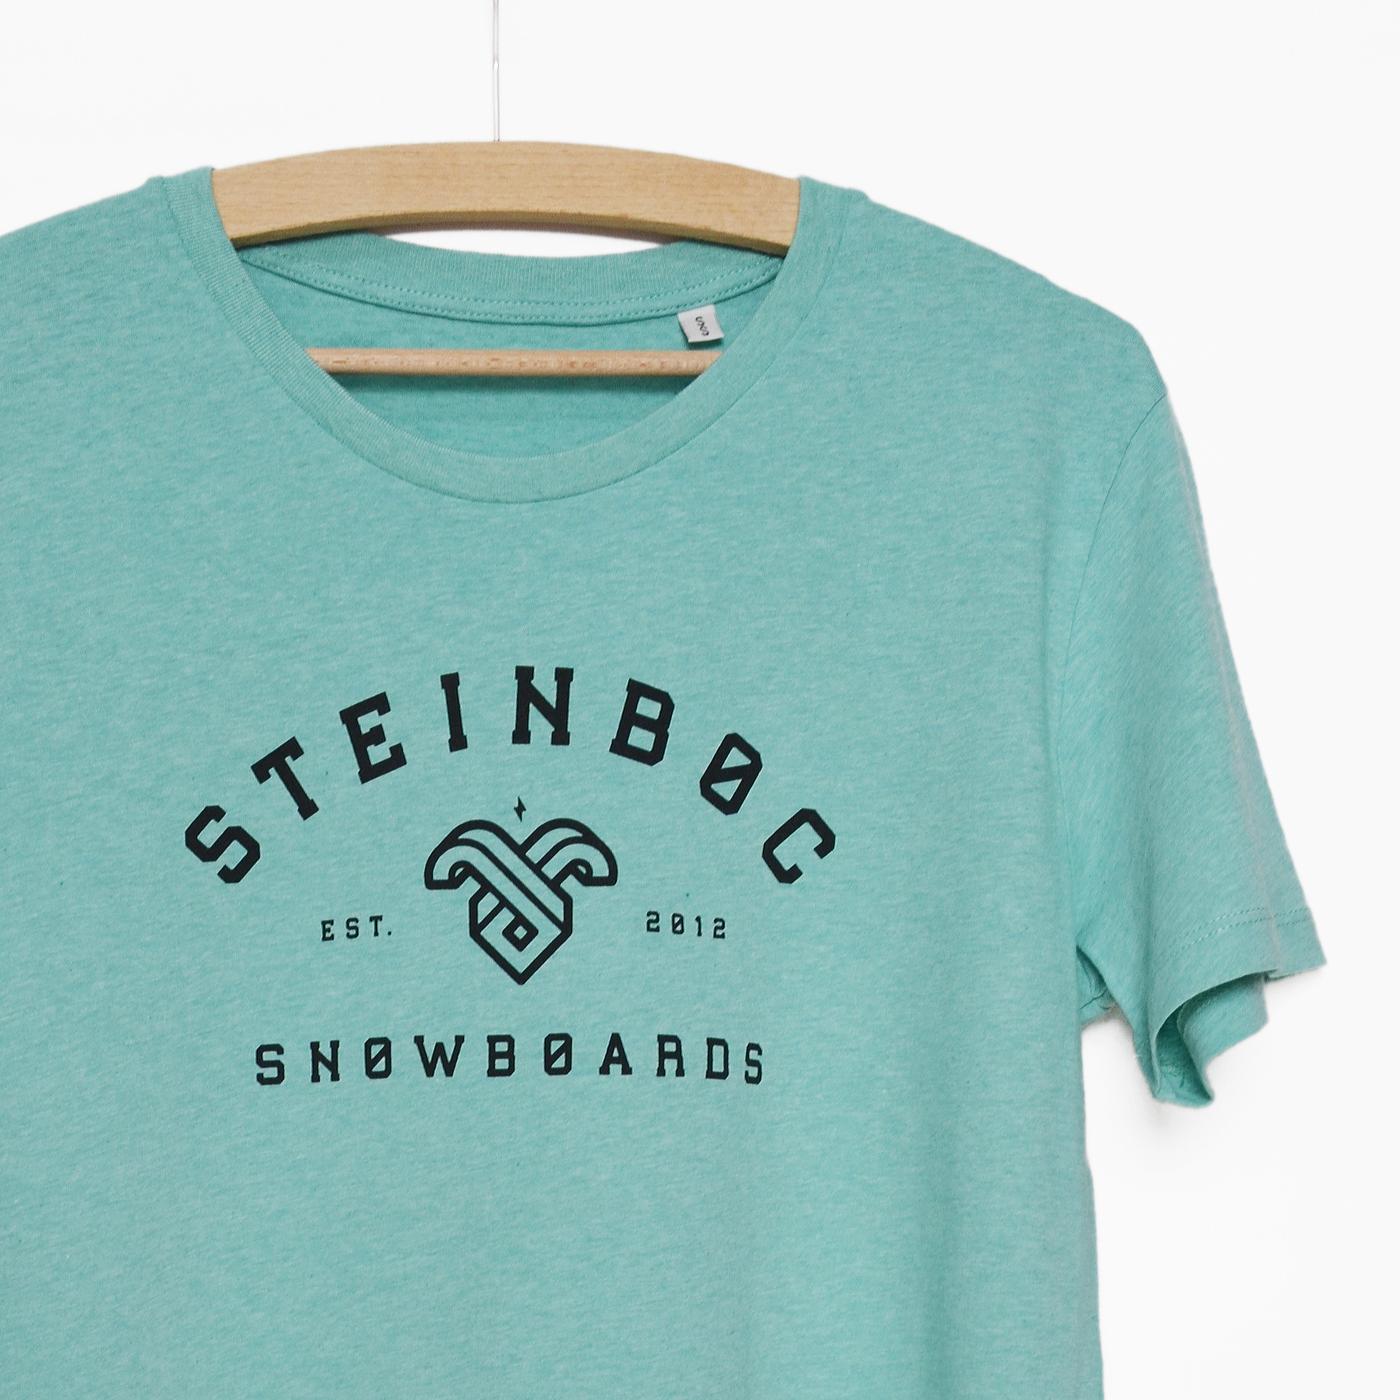 Shirt_Steinboc_Snowboards-Maenner_detail_quadrat_hp